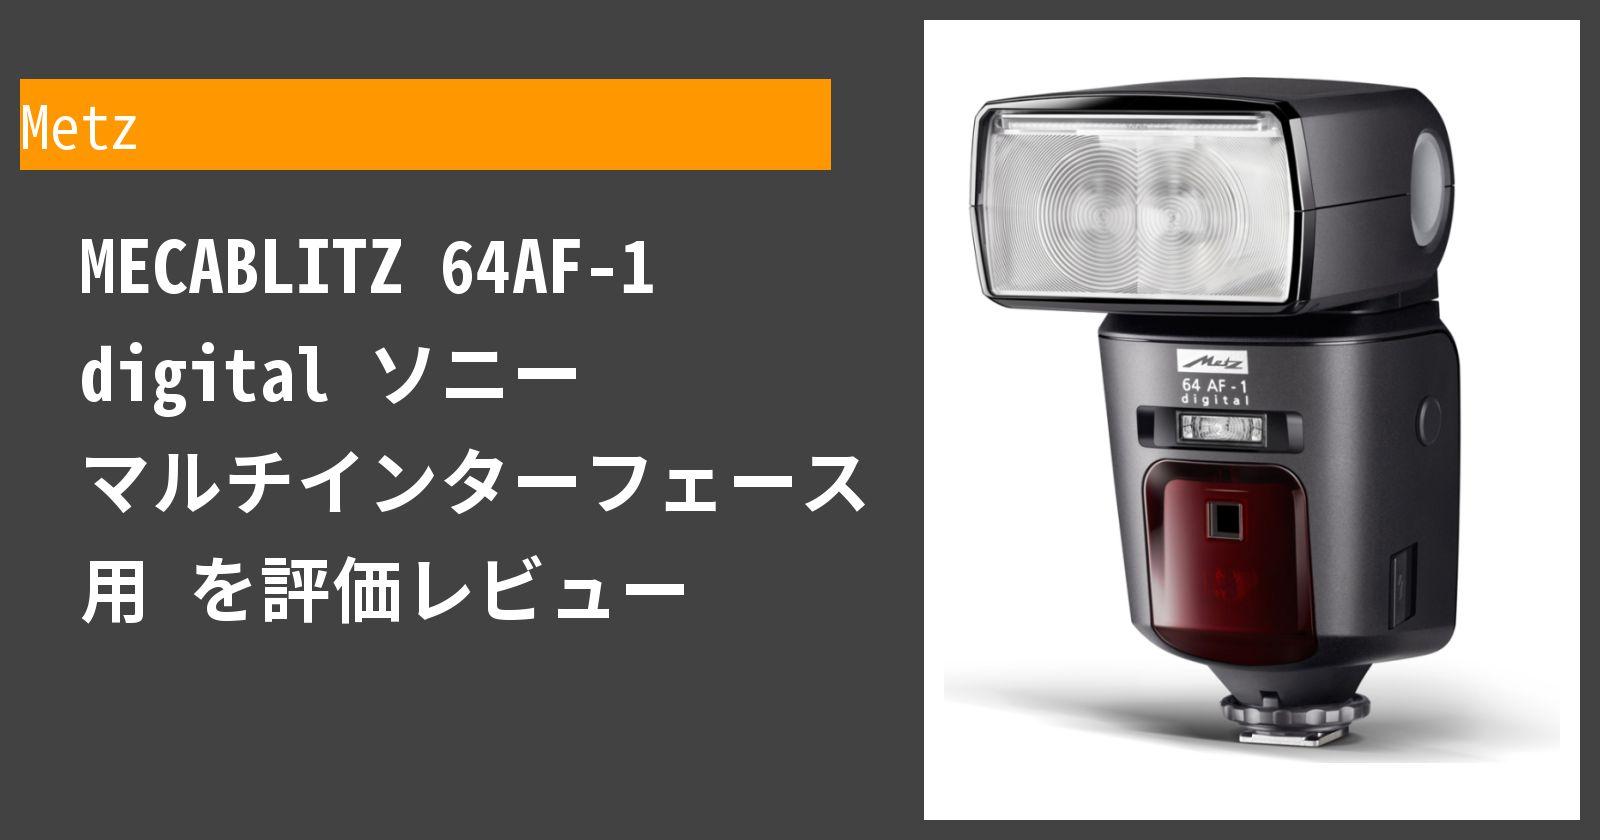 MECABLITZ 64AF-1 digital ソニー マルチインターフェース用を徹底評価